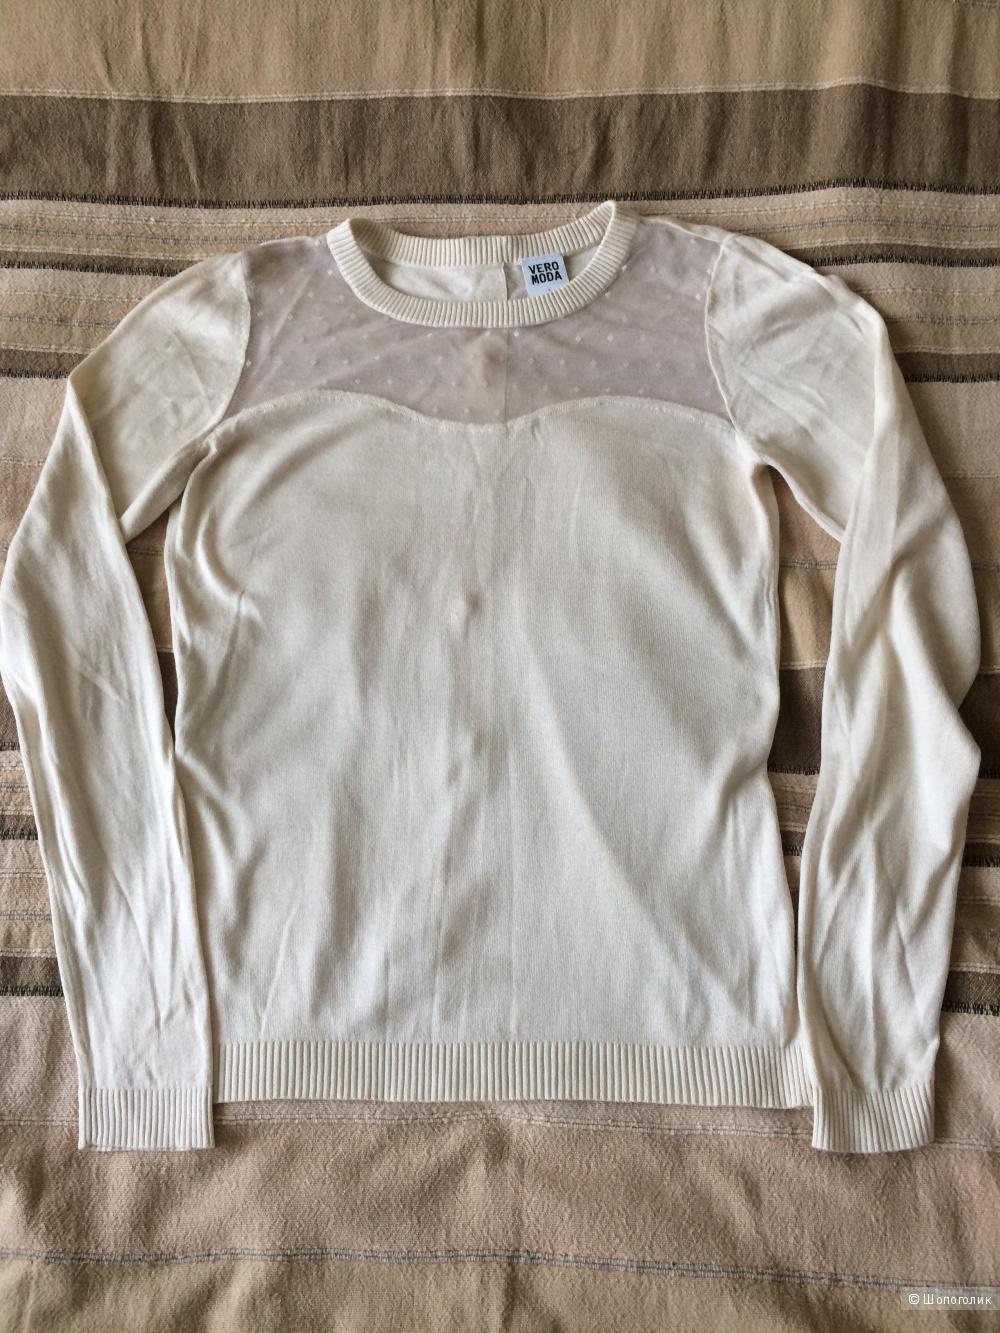 Тонкий джемпер от Vero moda, размер S